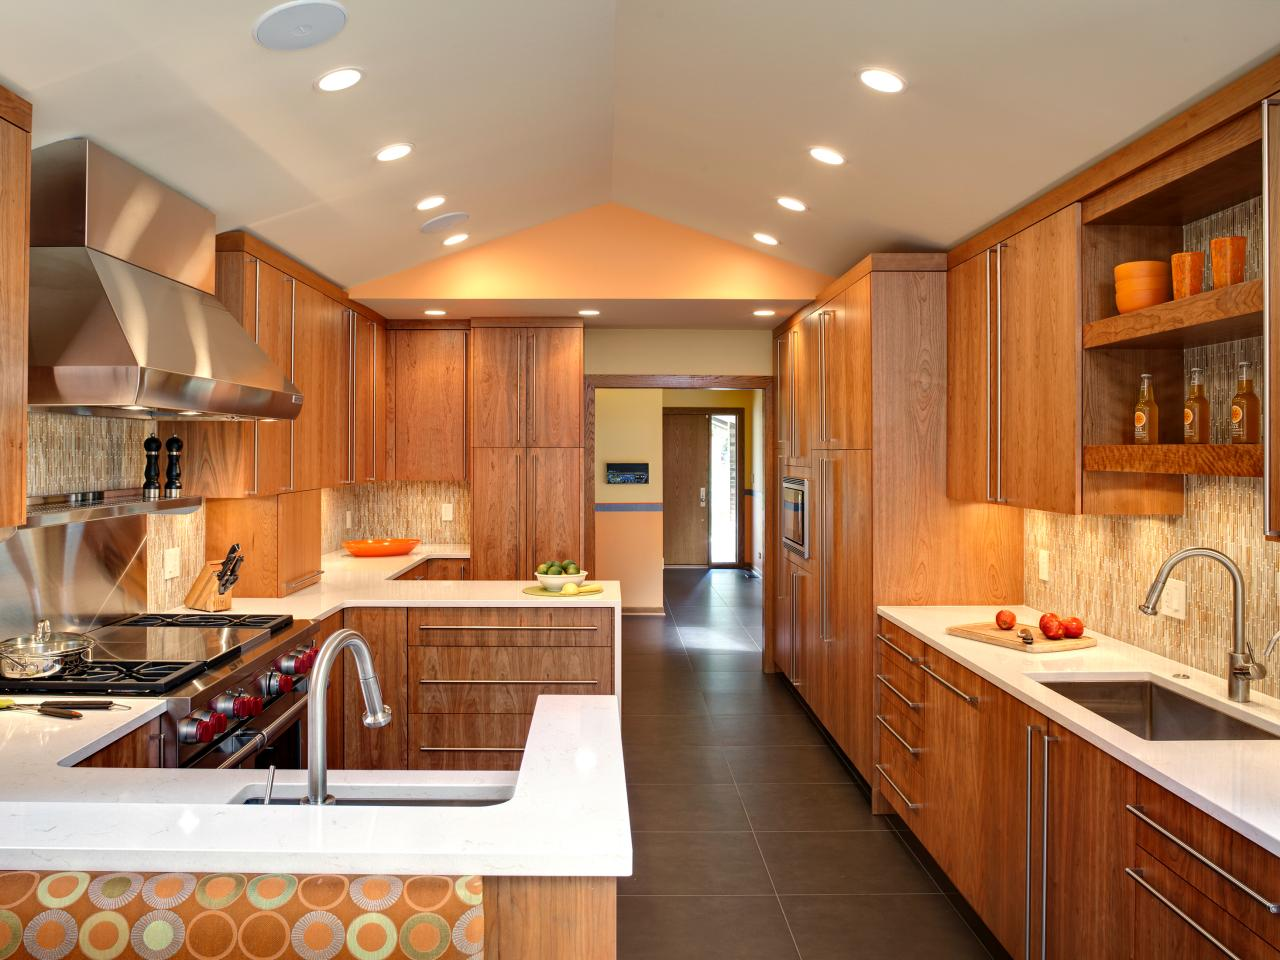 L Shaped Kitchen Designs Hgtv photo - 2